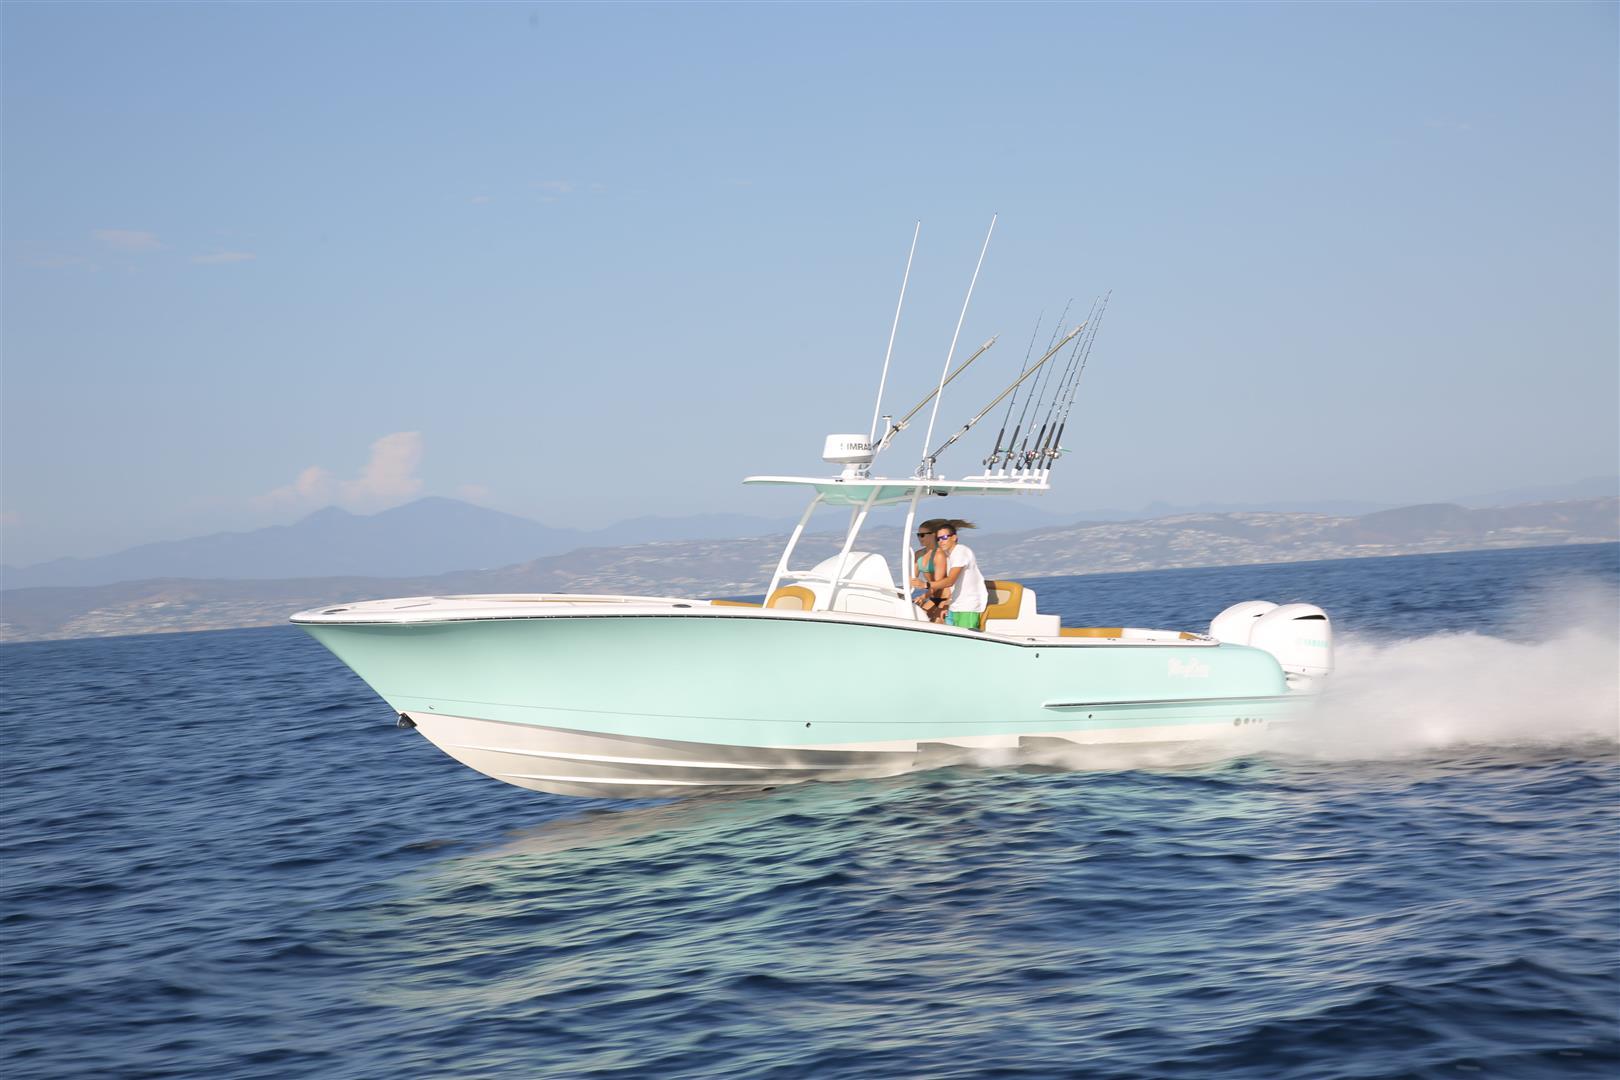 Mag_Bay_33_Yachting_Experts571